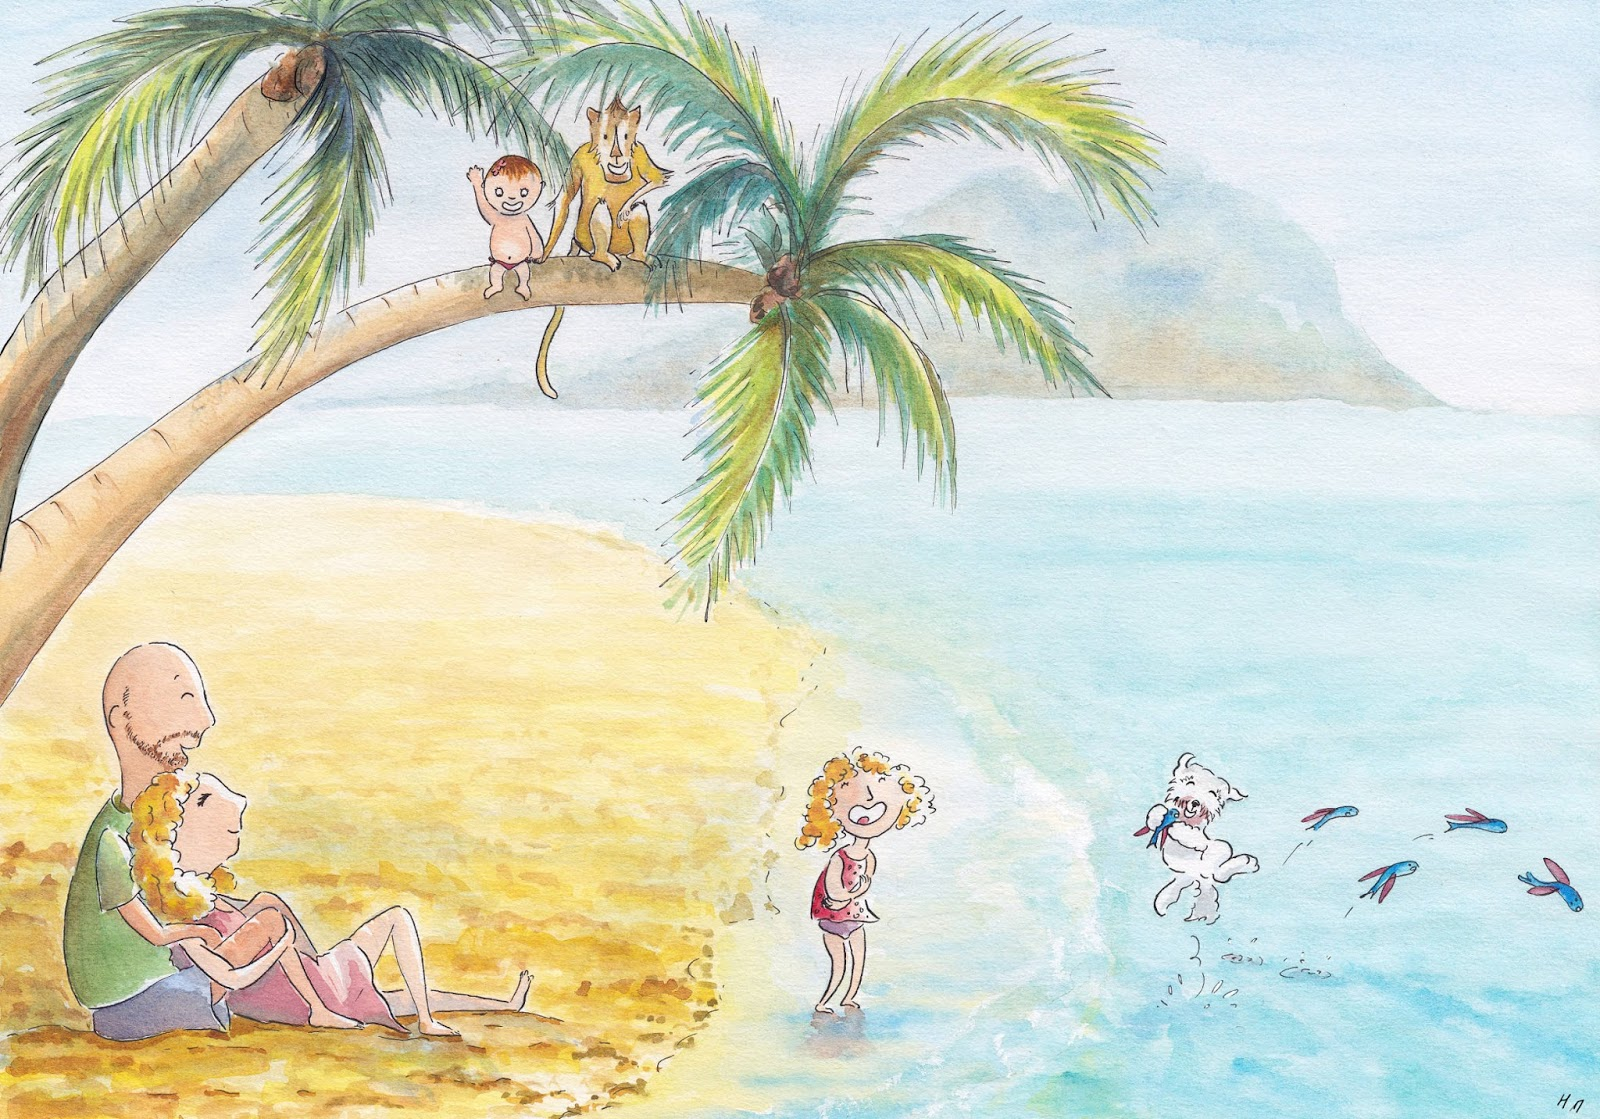 carte de voeux personnalisée customed card illustration jeunesse children newborn vacance holiday